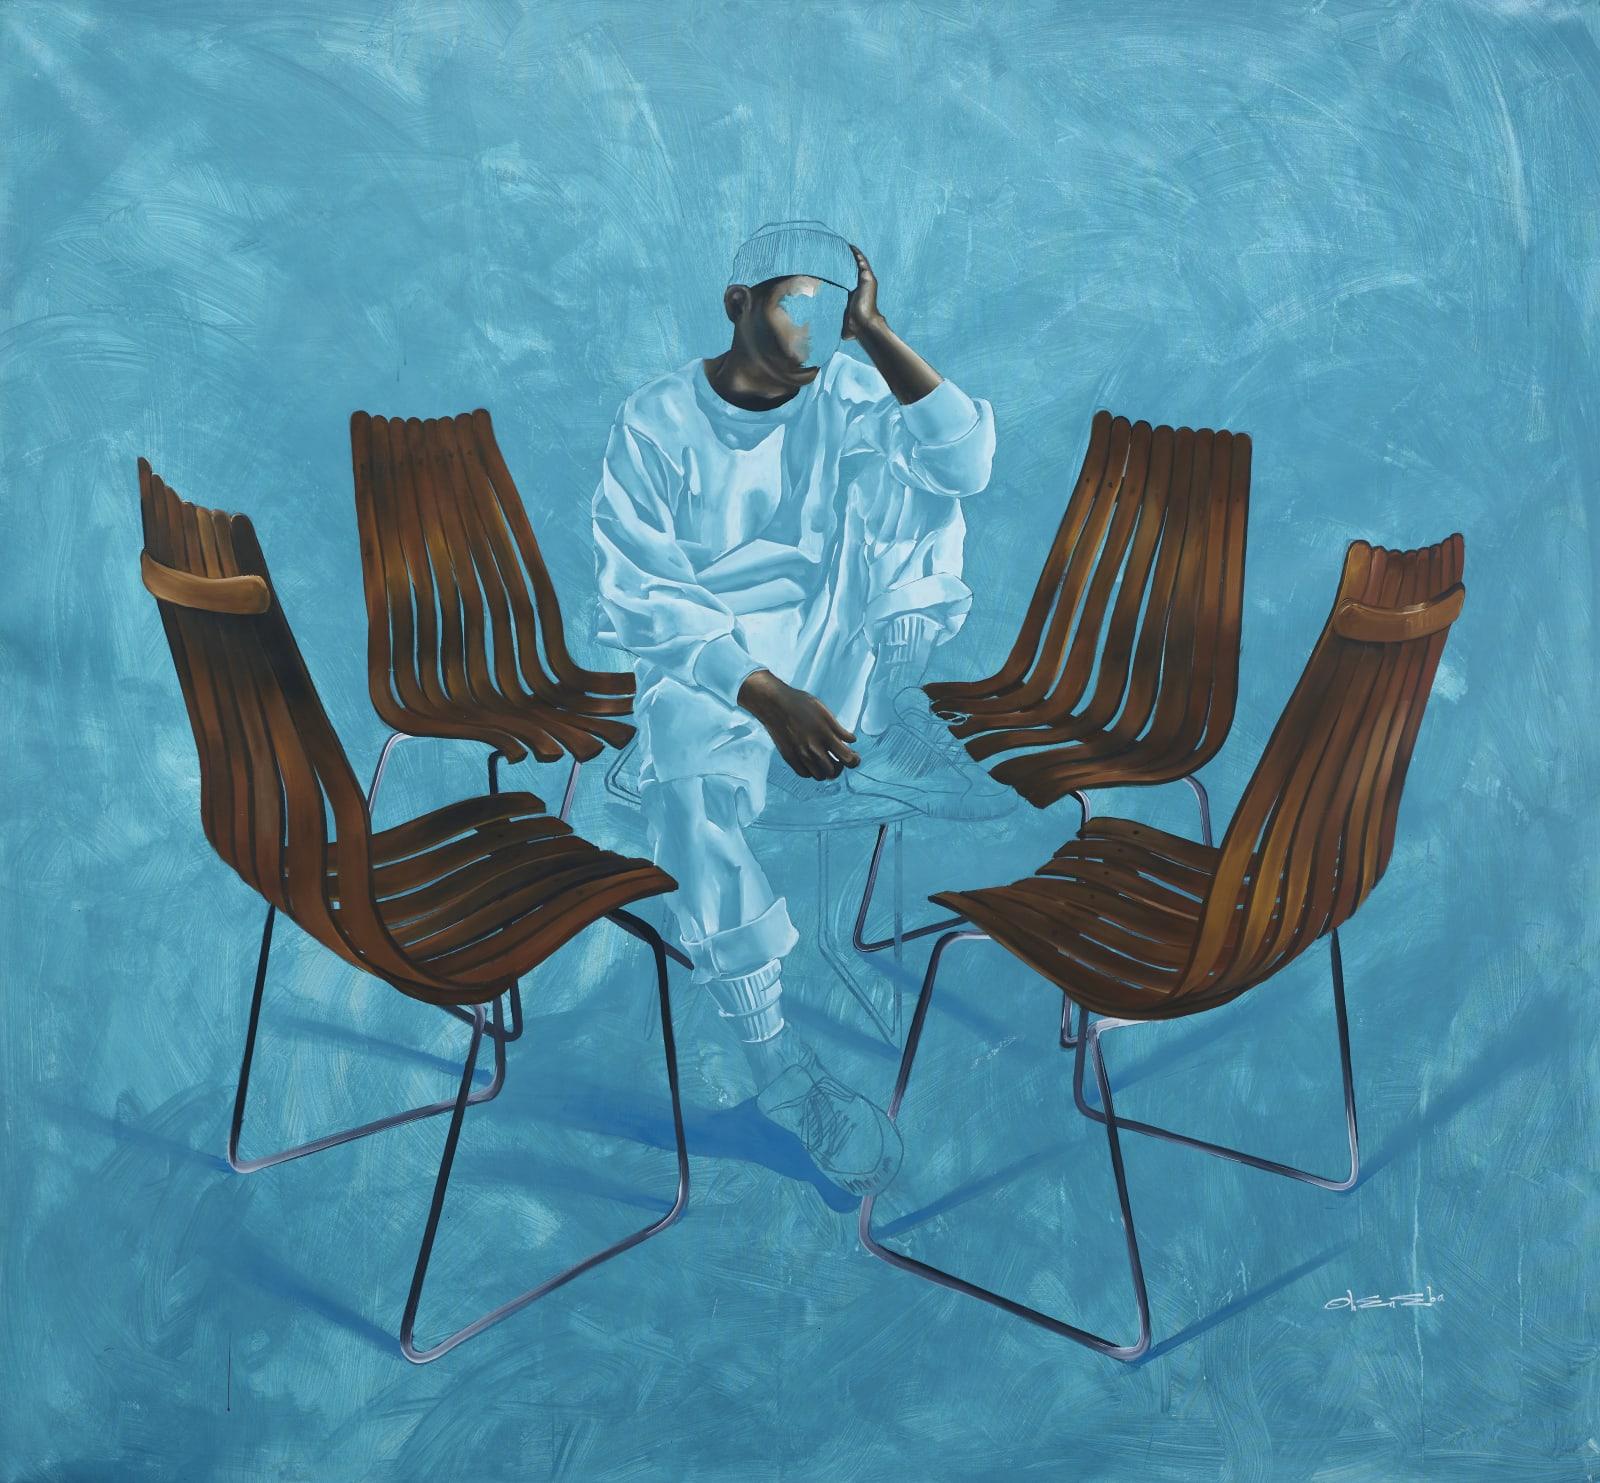 Joshua Oheneba-Takyi, Things Fall Apart, 2021